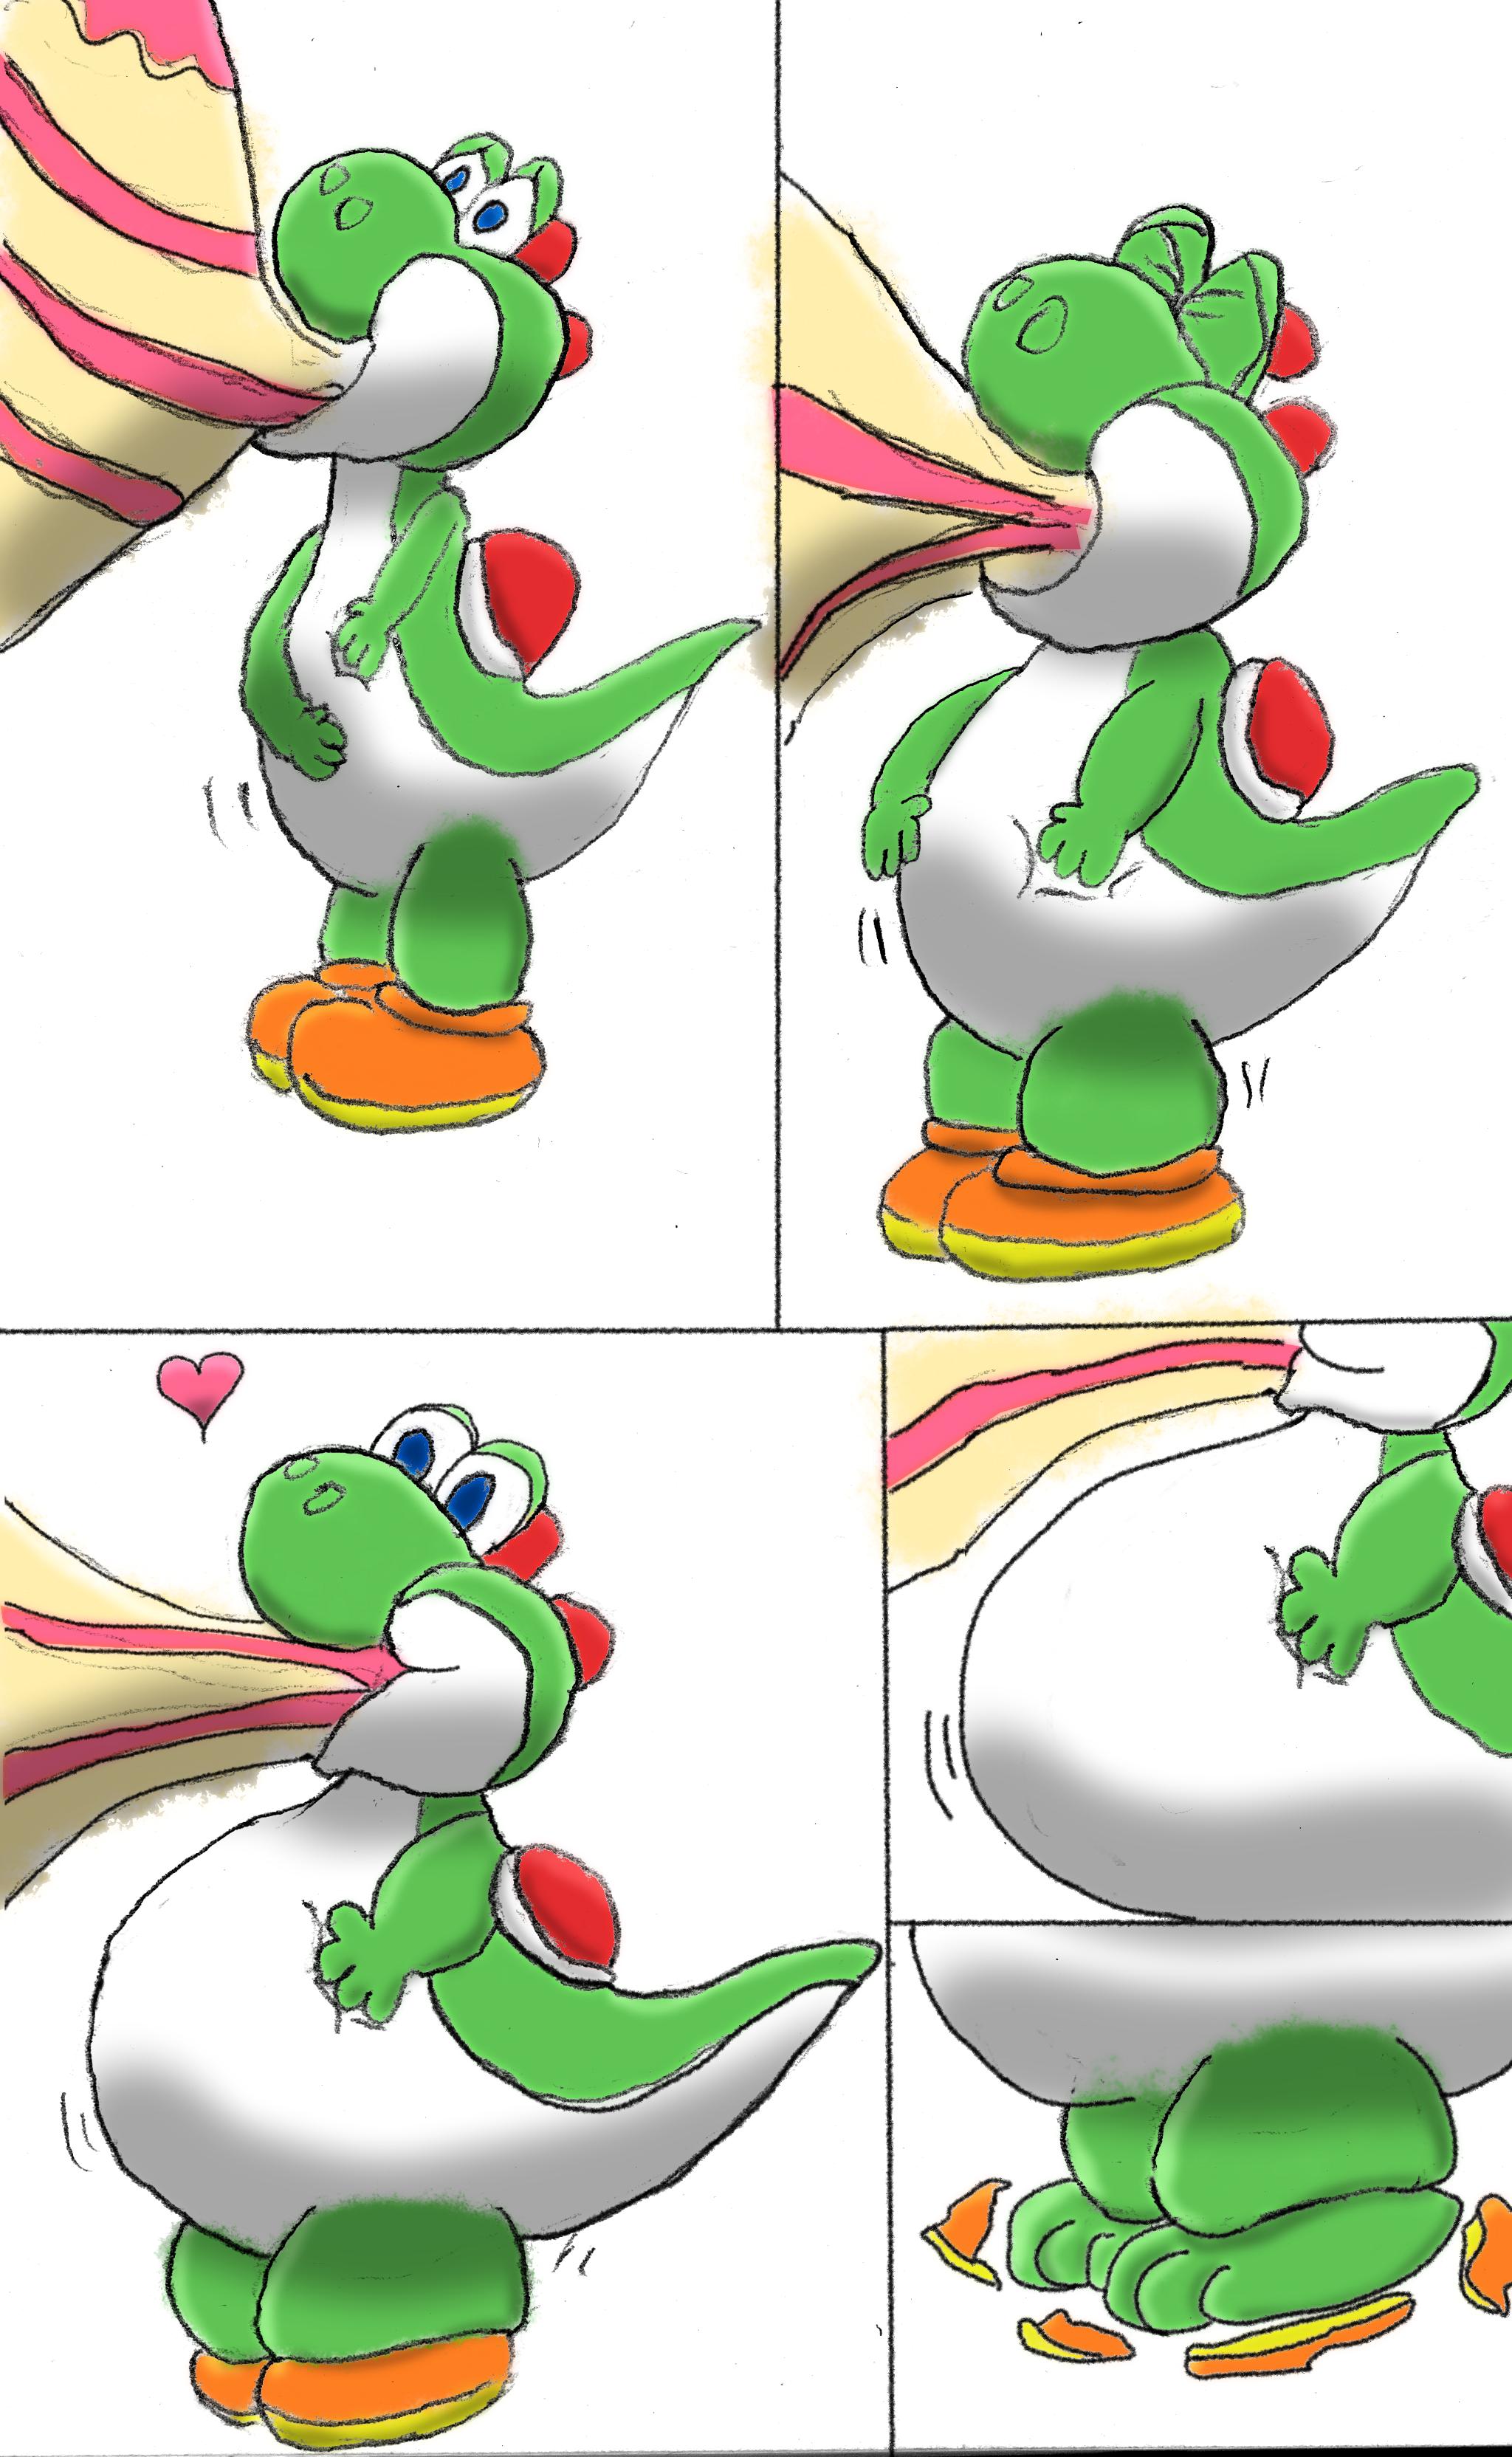 [Comic] Yoshi's surprise 2 of 3 by fatty-piggy